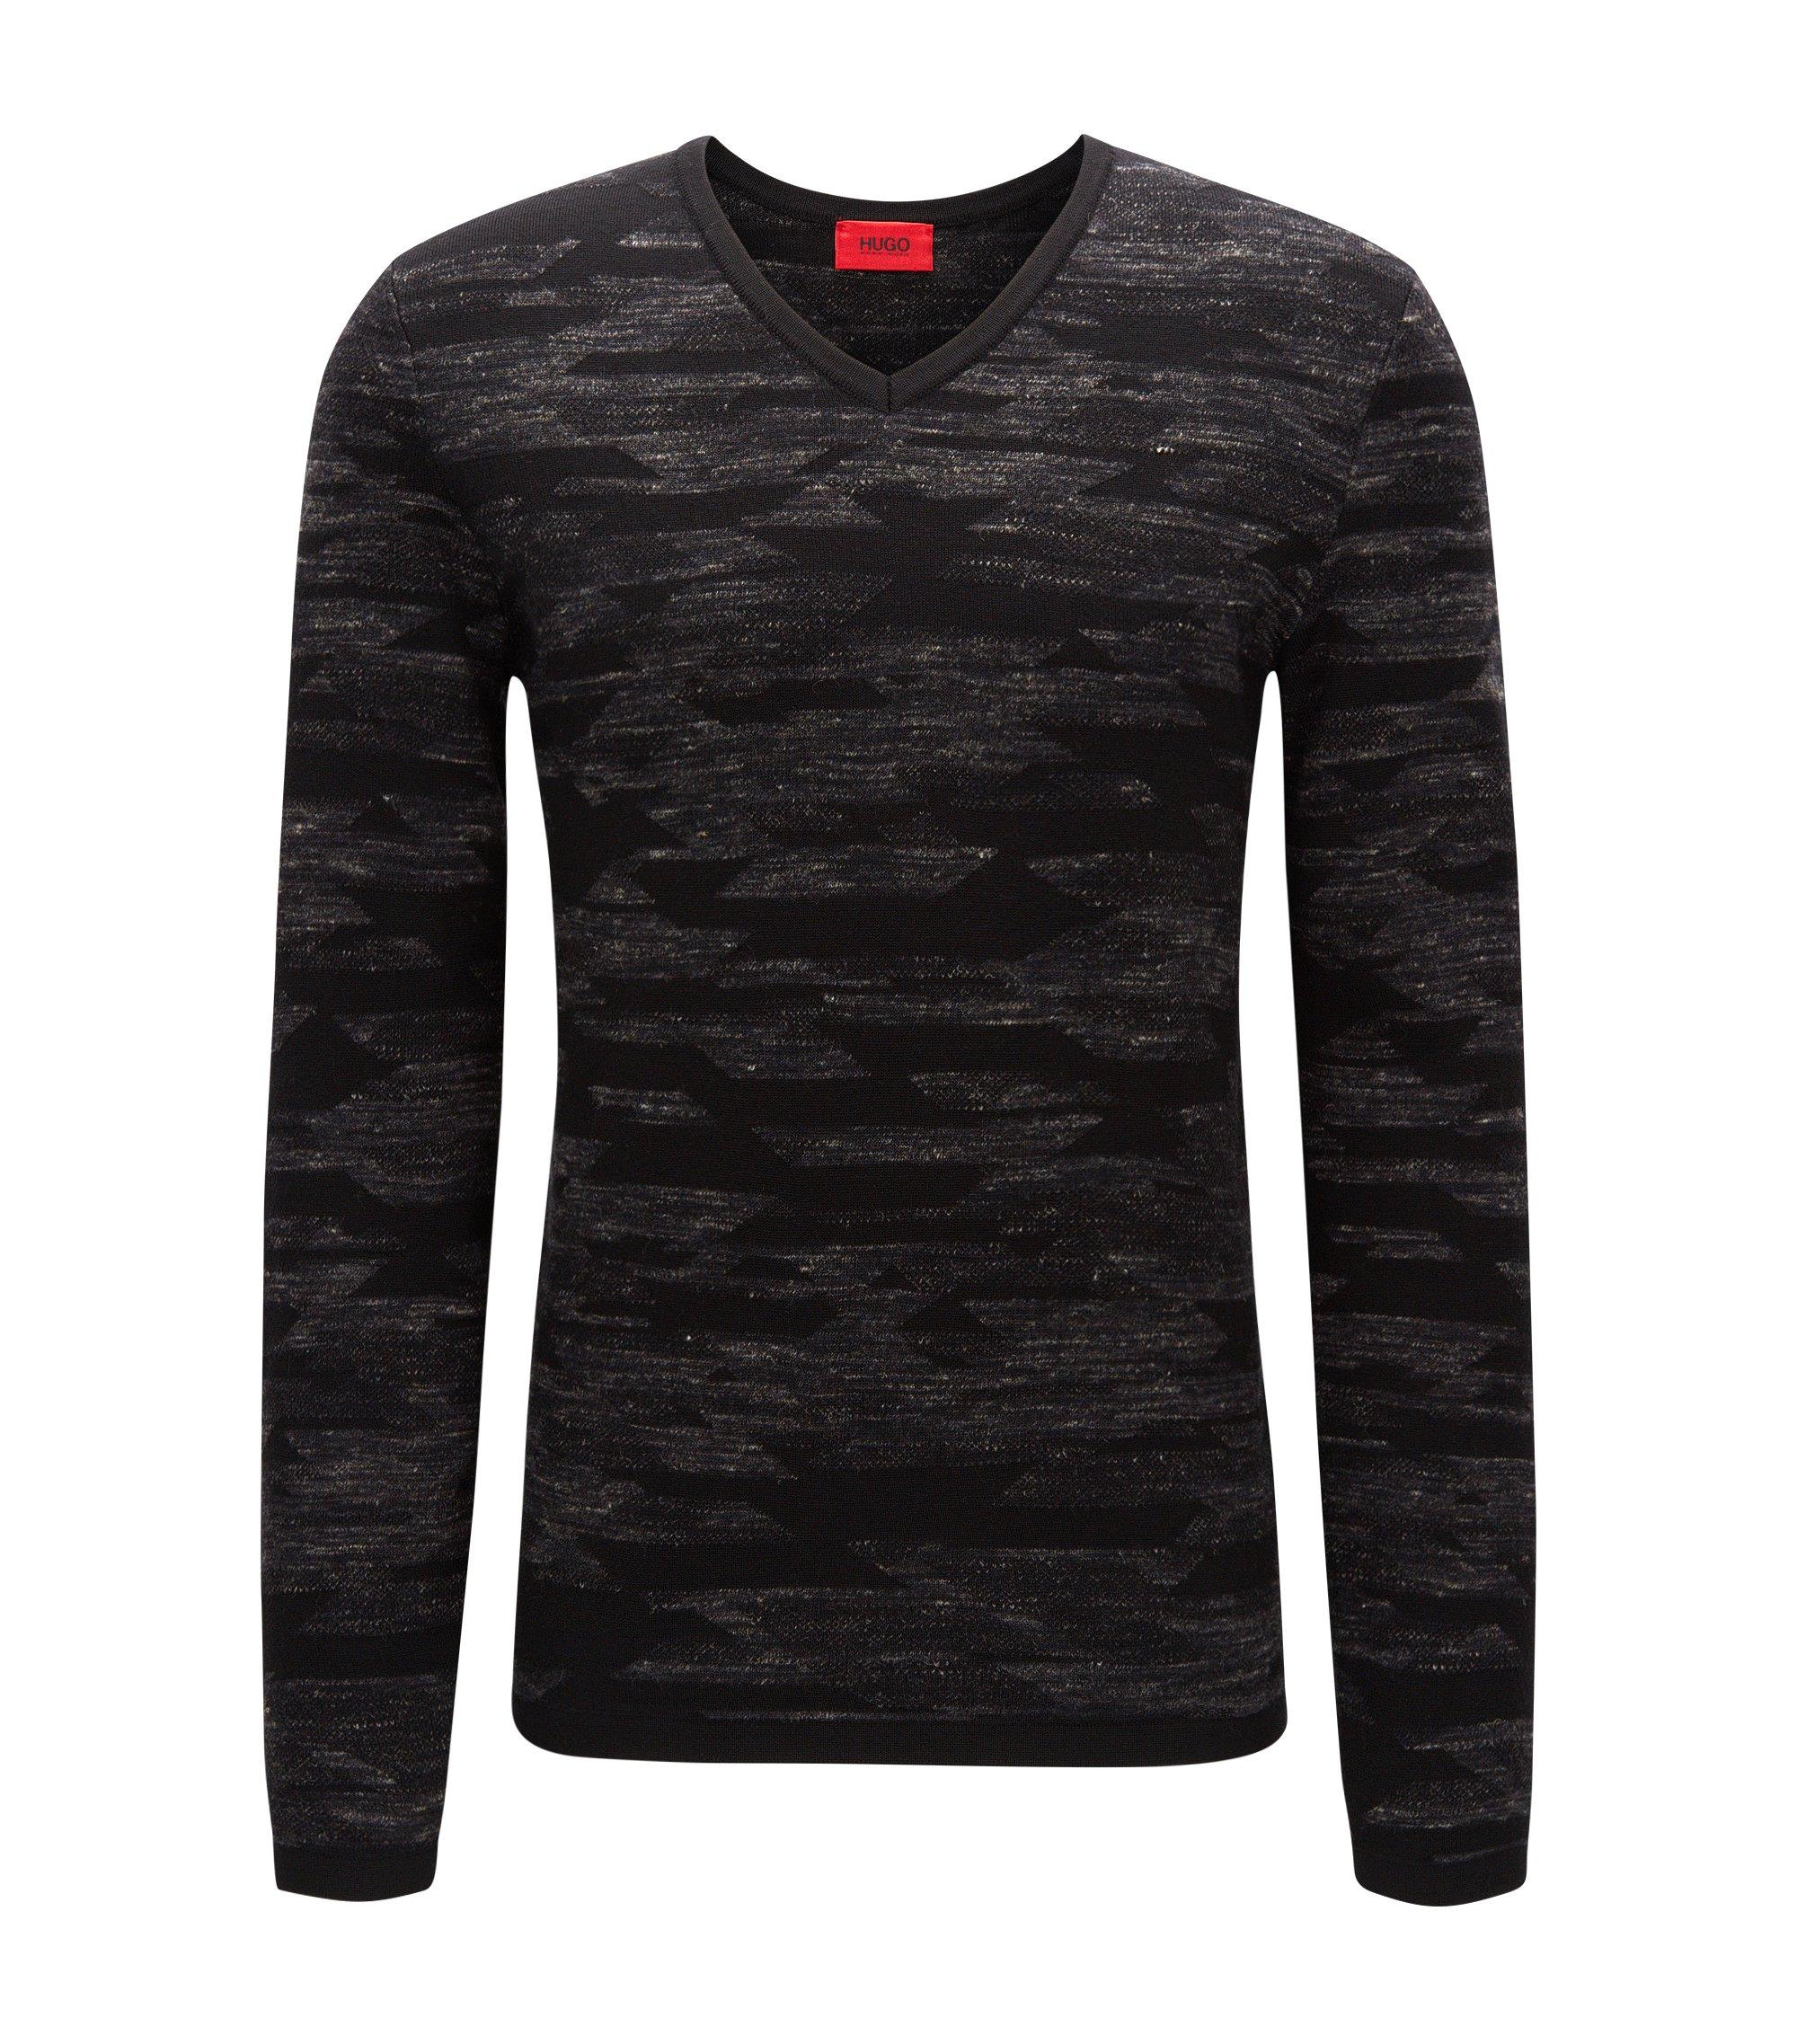 Wool Blend Geometric Print Sweater | Sindo, Charcoal